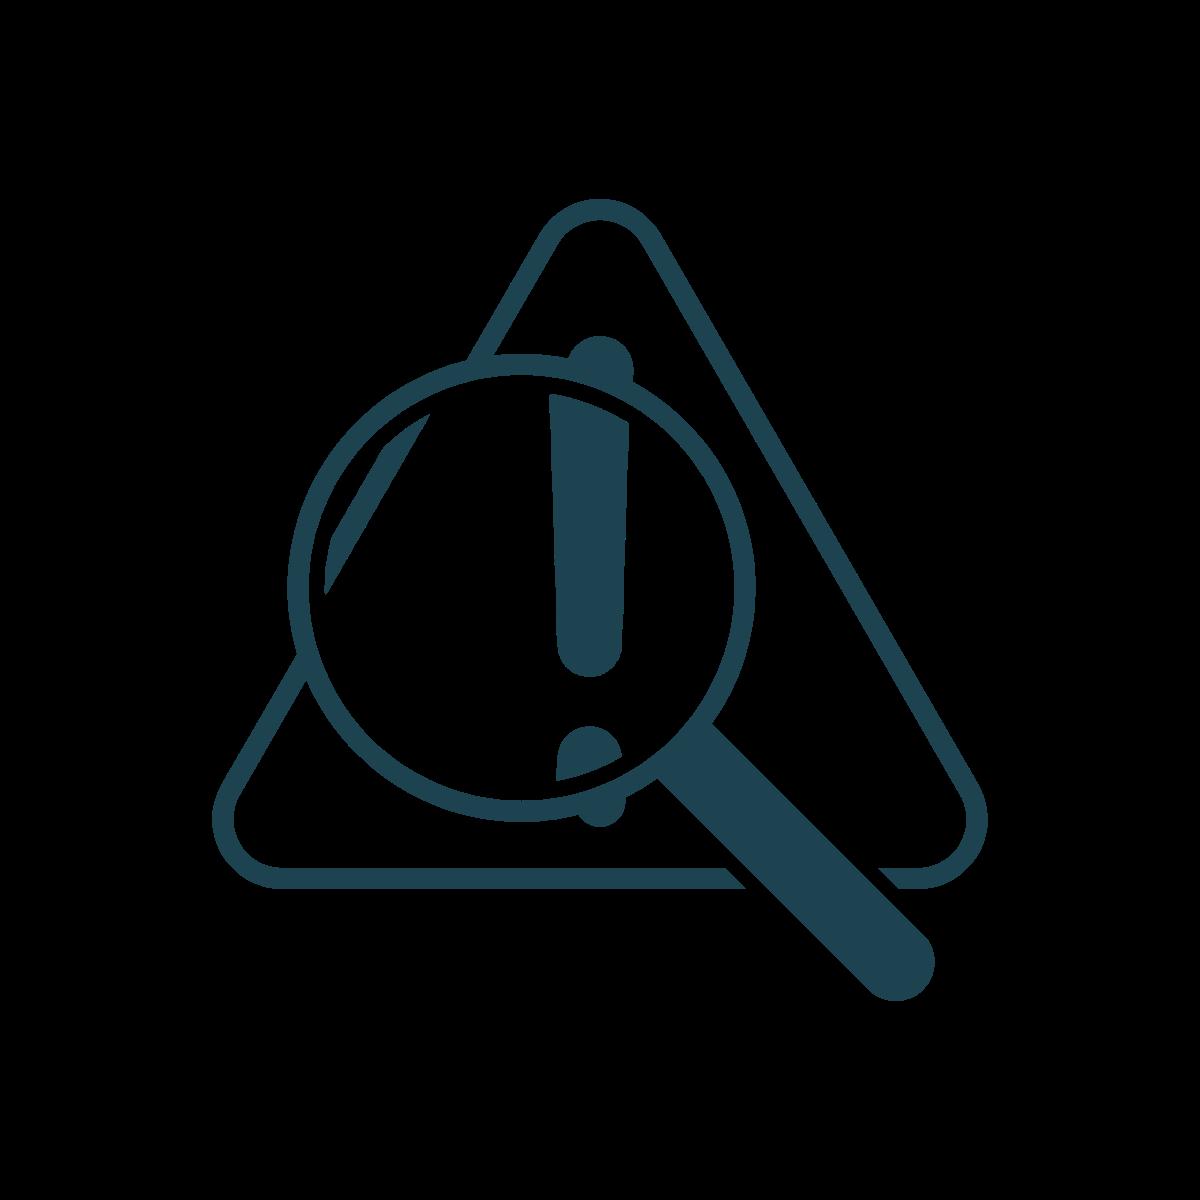 identify problem icon